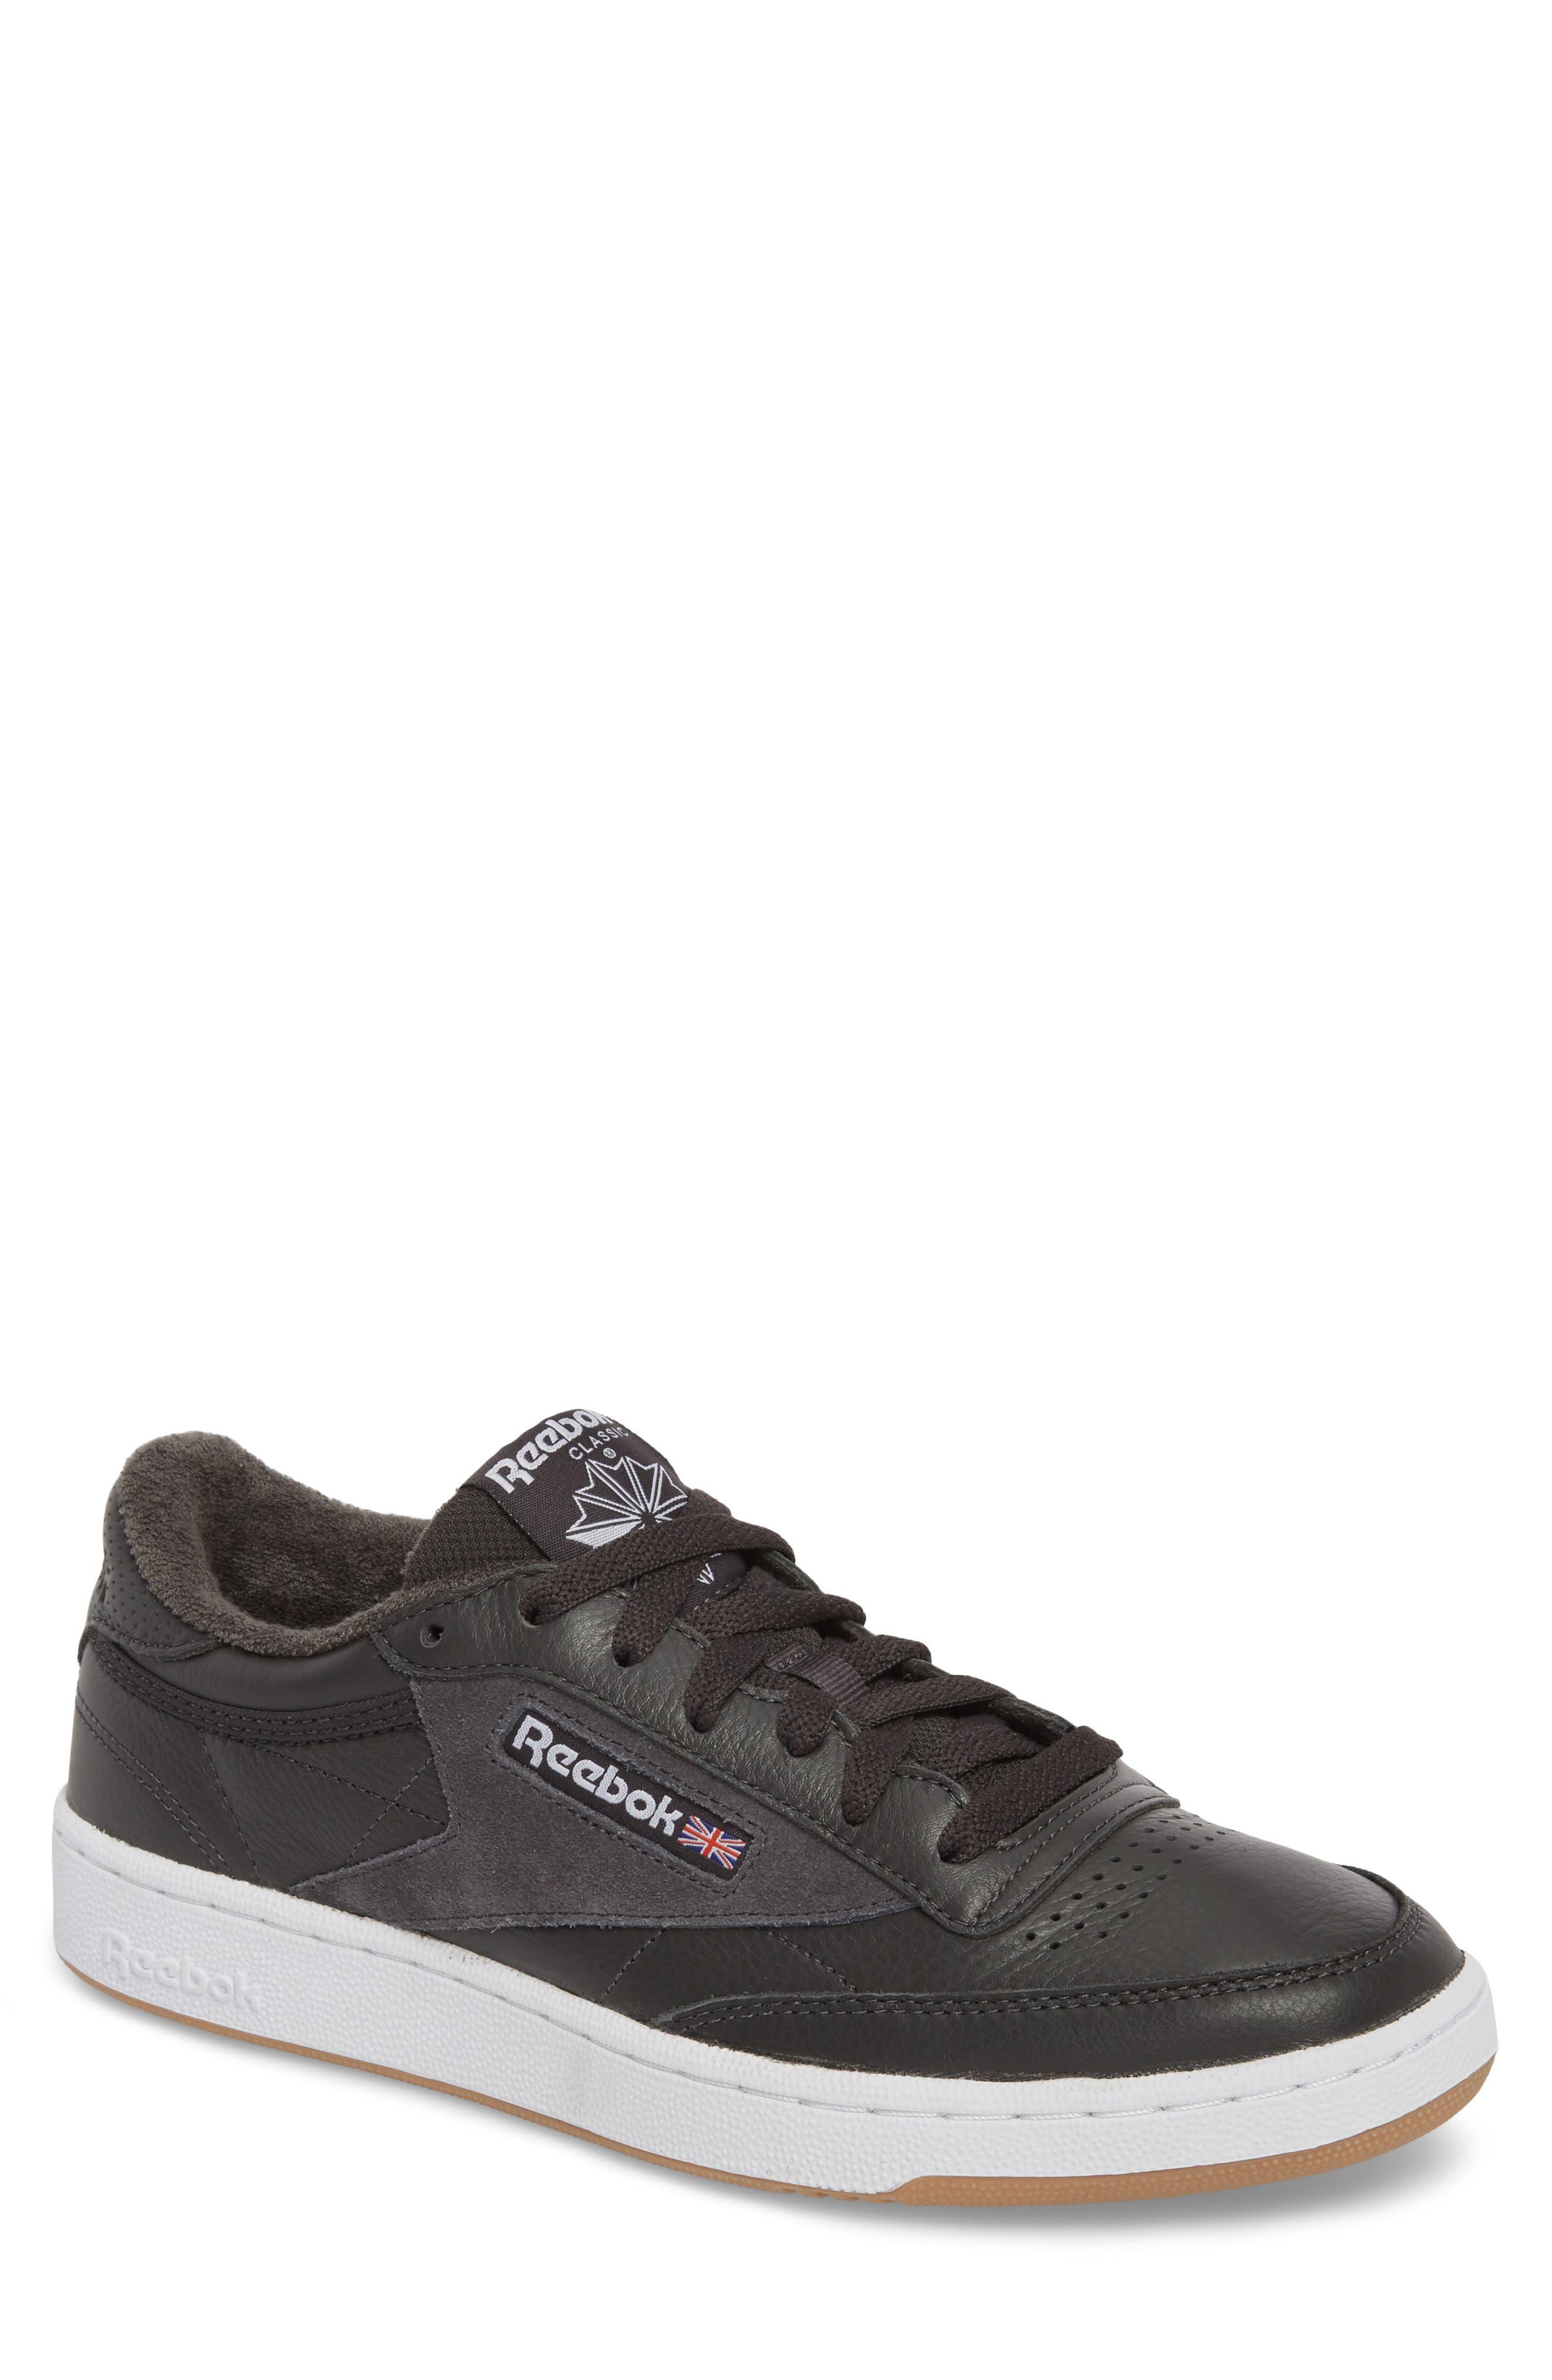 Club C 85 ESTL Sneaker,                             Main thumbnail 1, color,